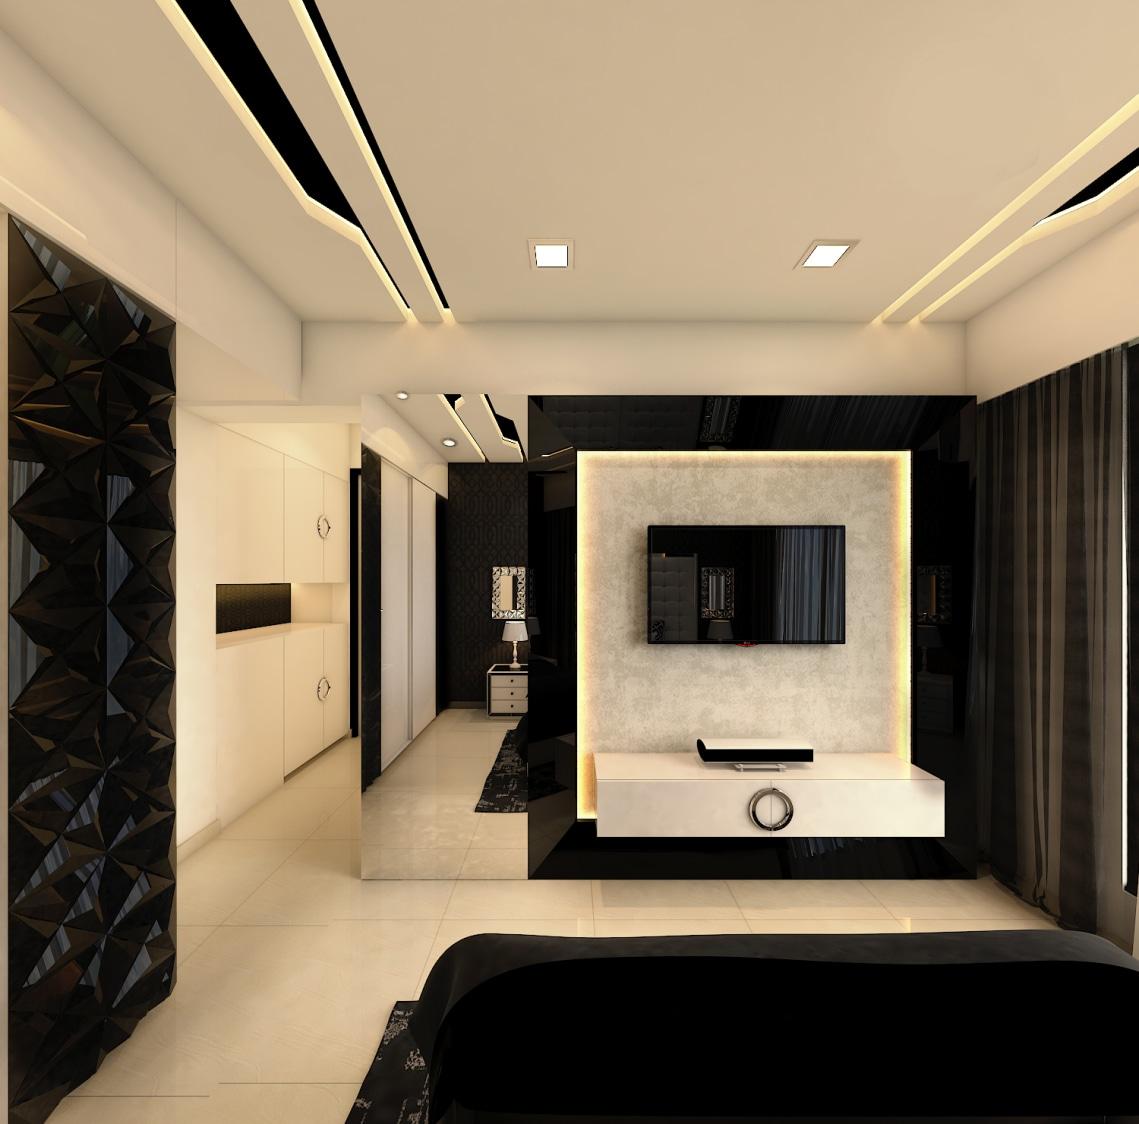 THE IMPERFECT SYMMETRY by Nidhi Rathod Contemporary | Interior Design Photos & Ideas